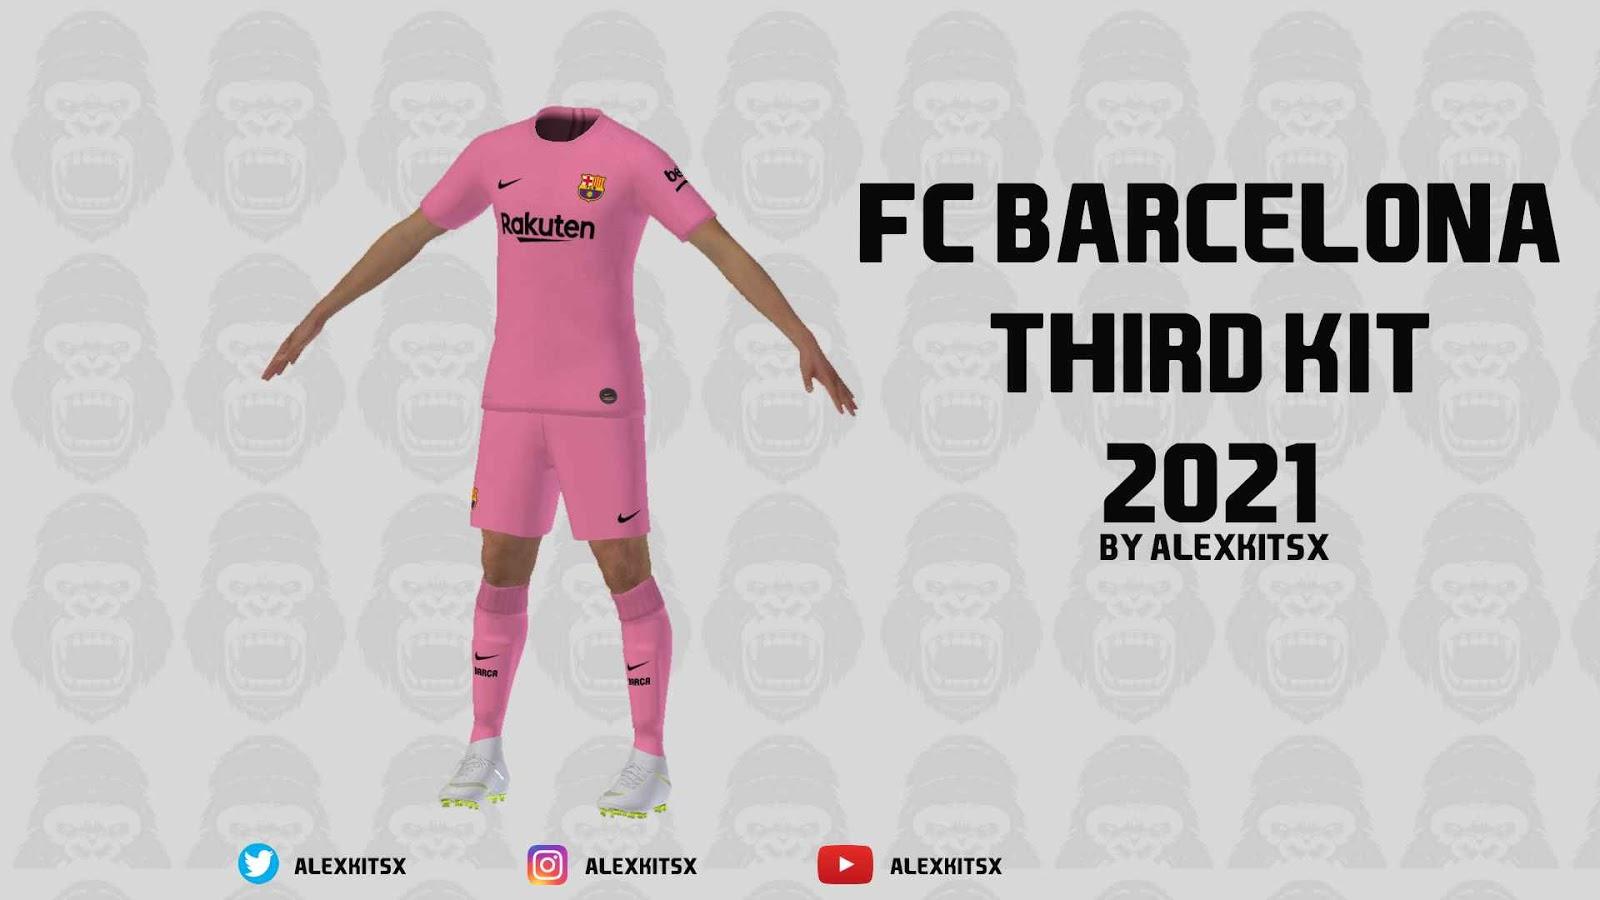 ultigamerz pes 2020 fc barcelona 2020 21 third kit pes 2020 fc barcelona 2020 21 third kit